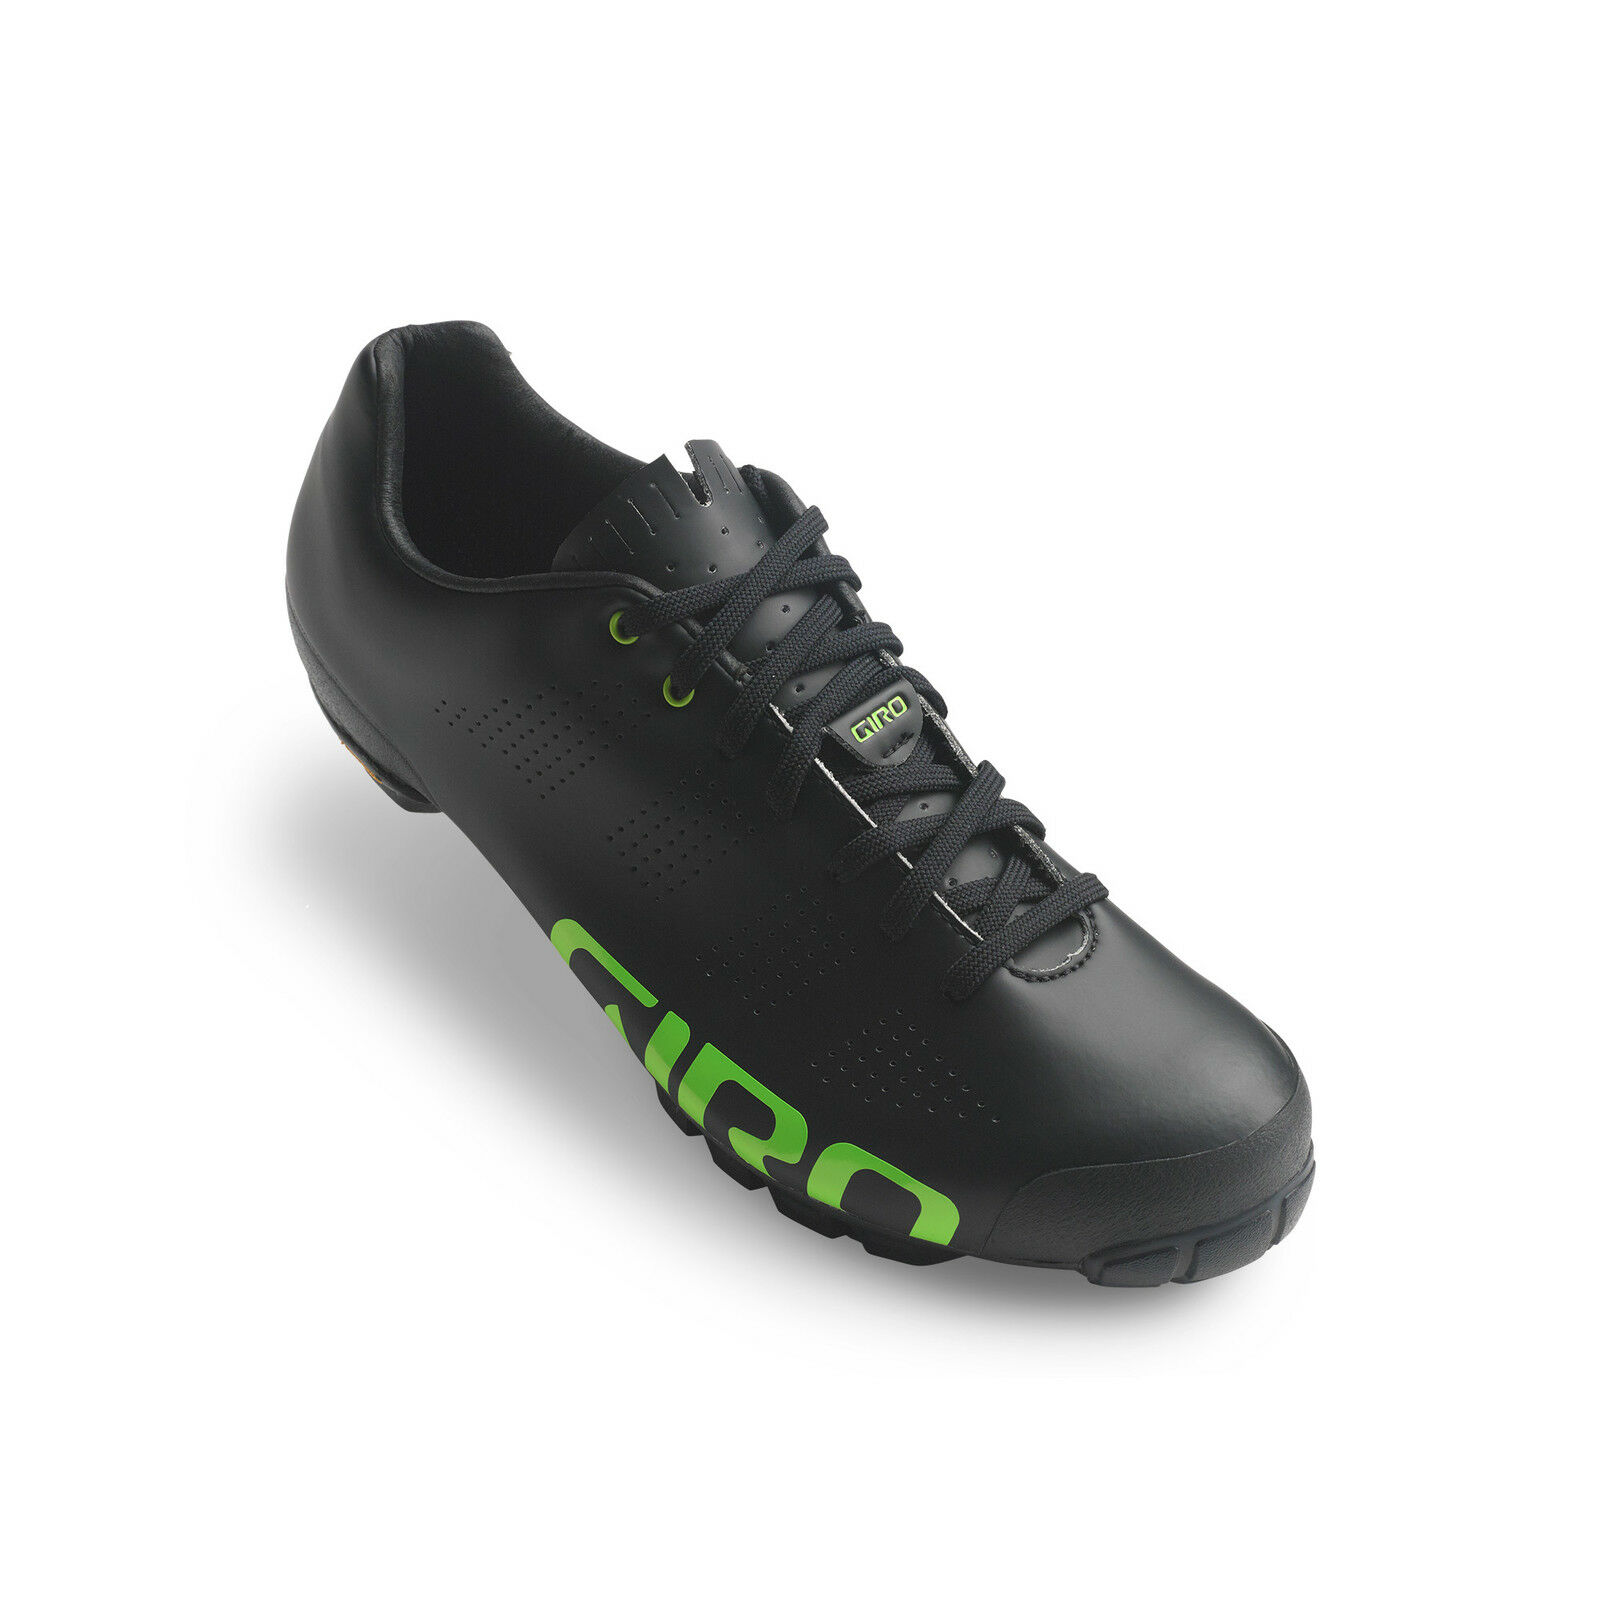 Giro Empire vr90 HV MTB bicicleta zapatos negro verde 2019